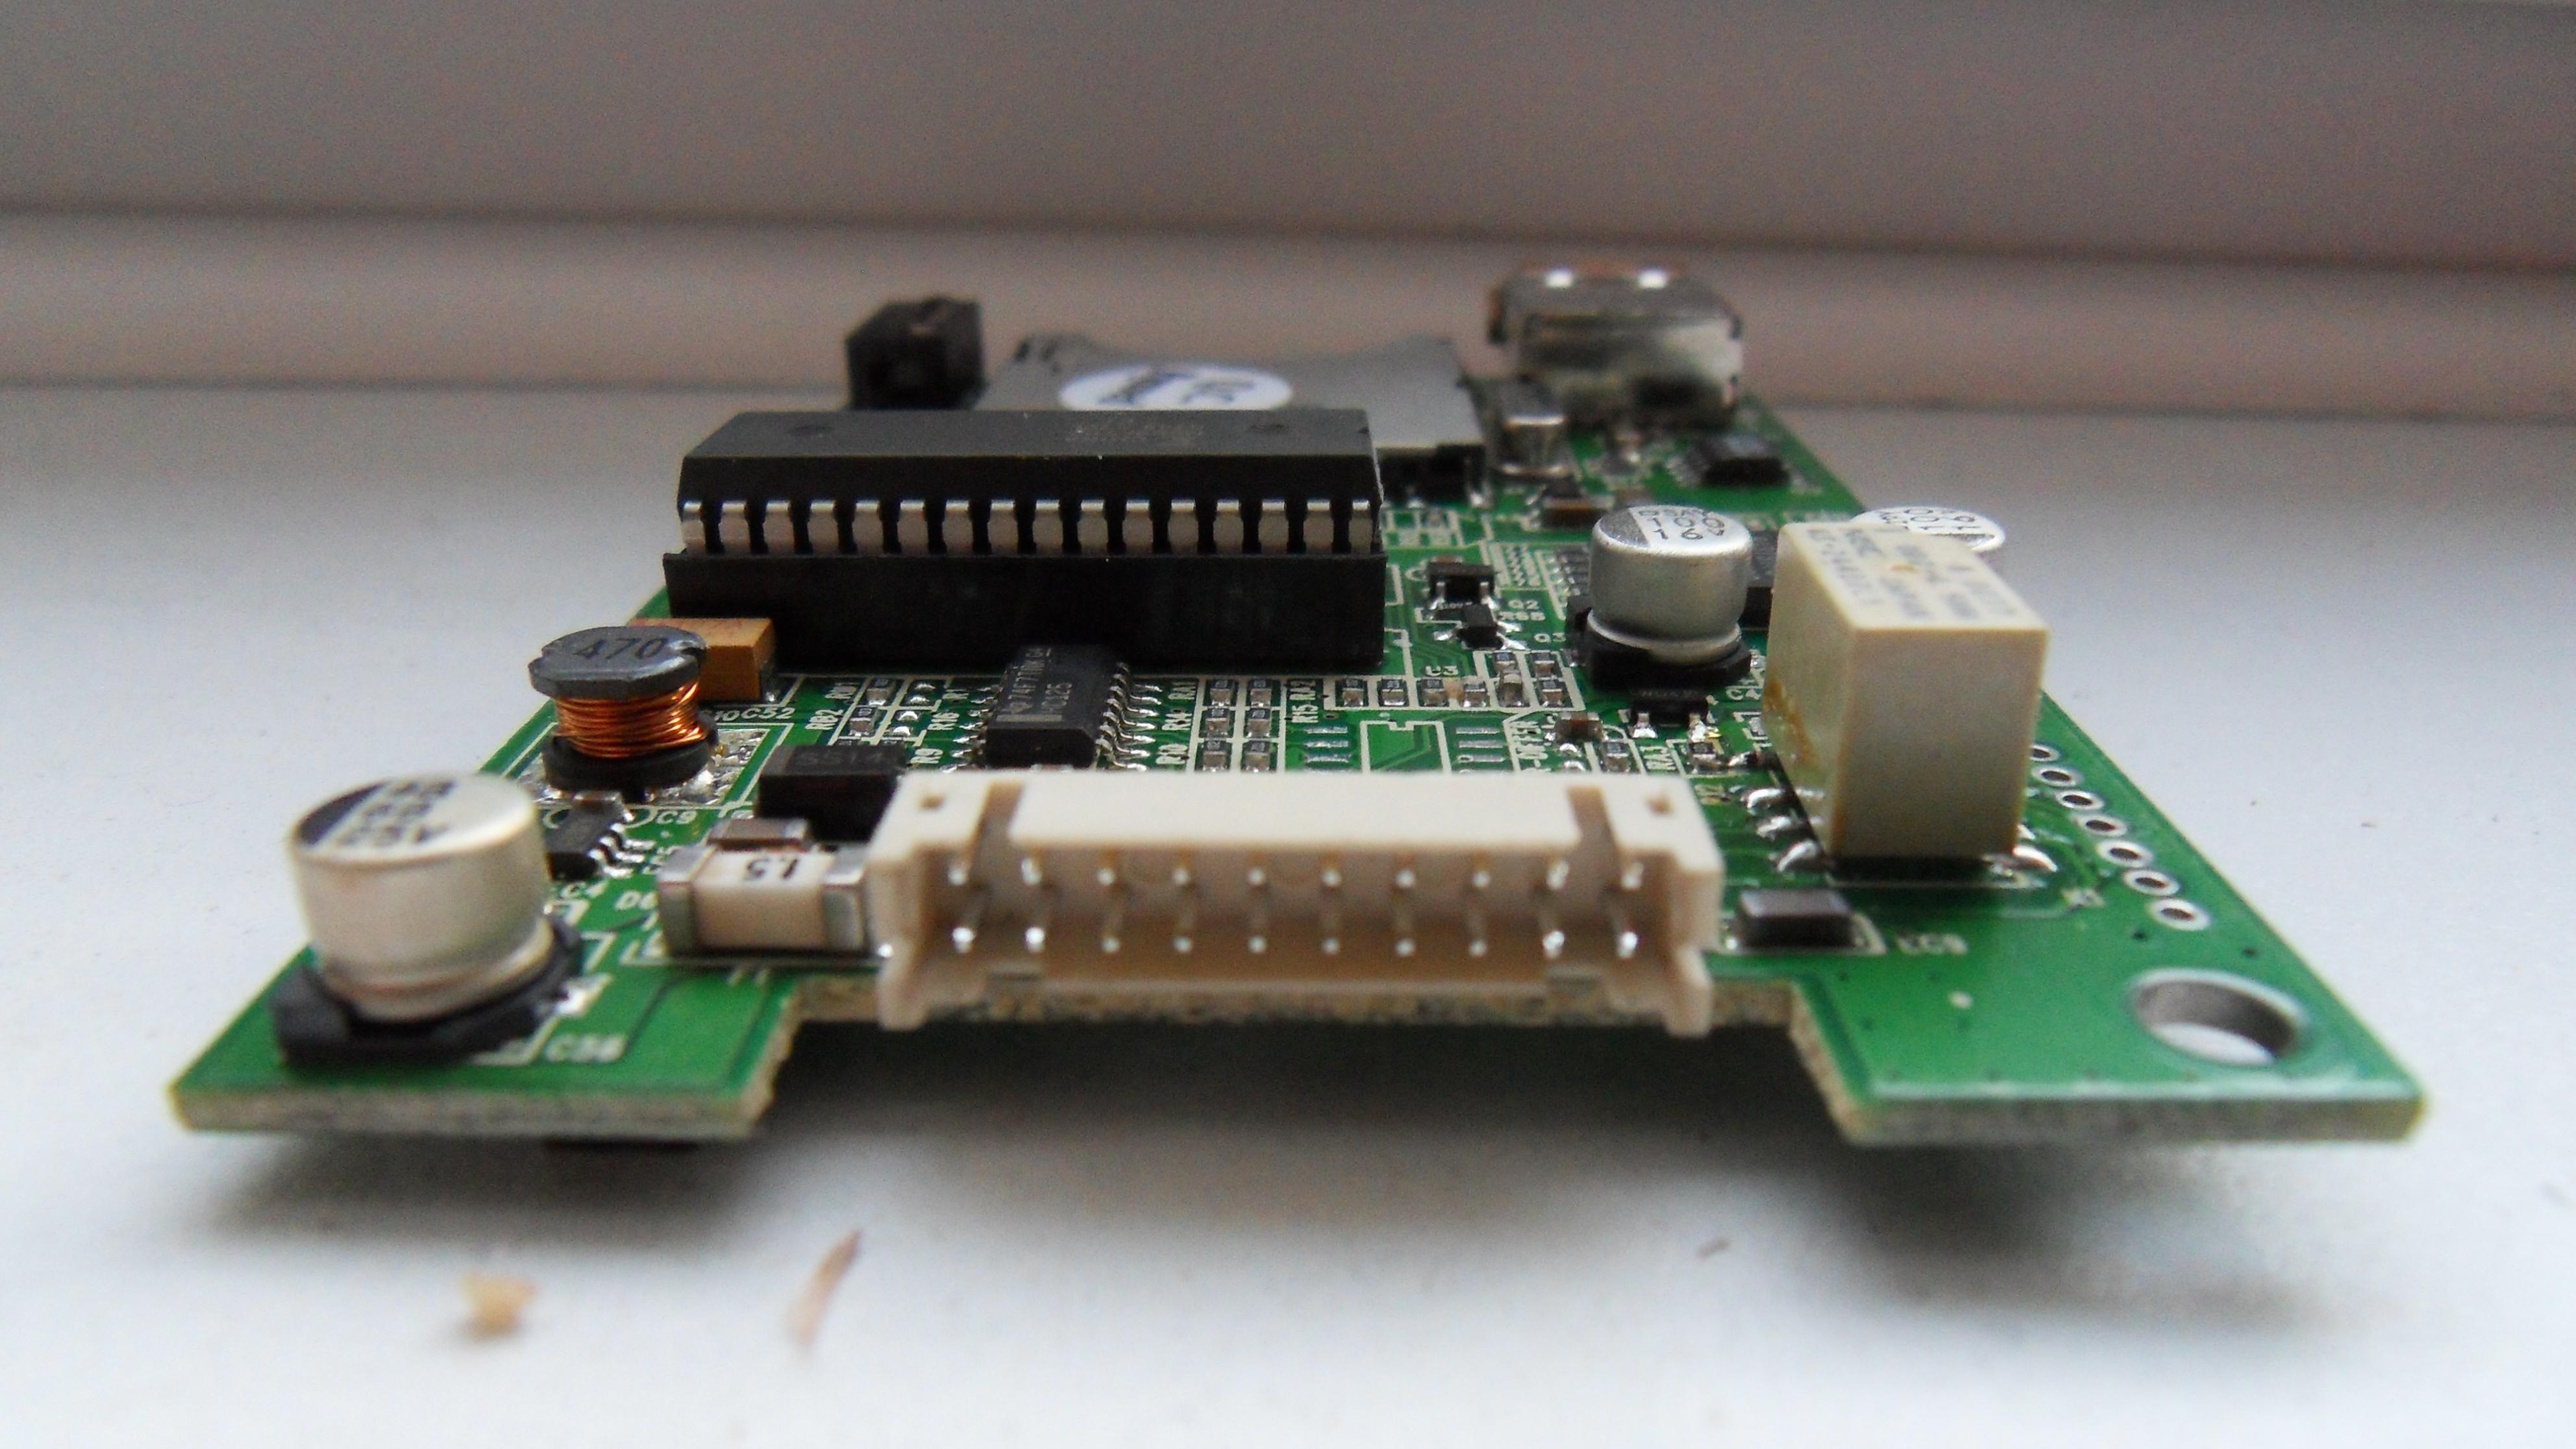 Emulatore lancia 846 per porta usb radio stereo - Autoradio lancia ypsilon porta usb ...